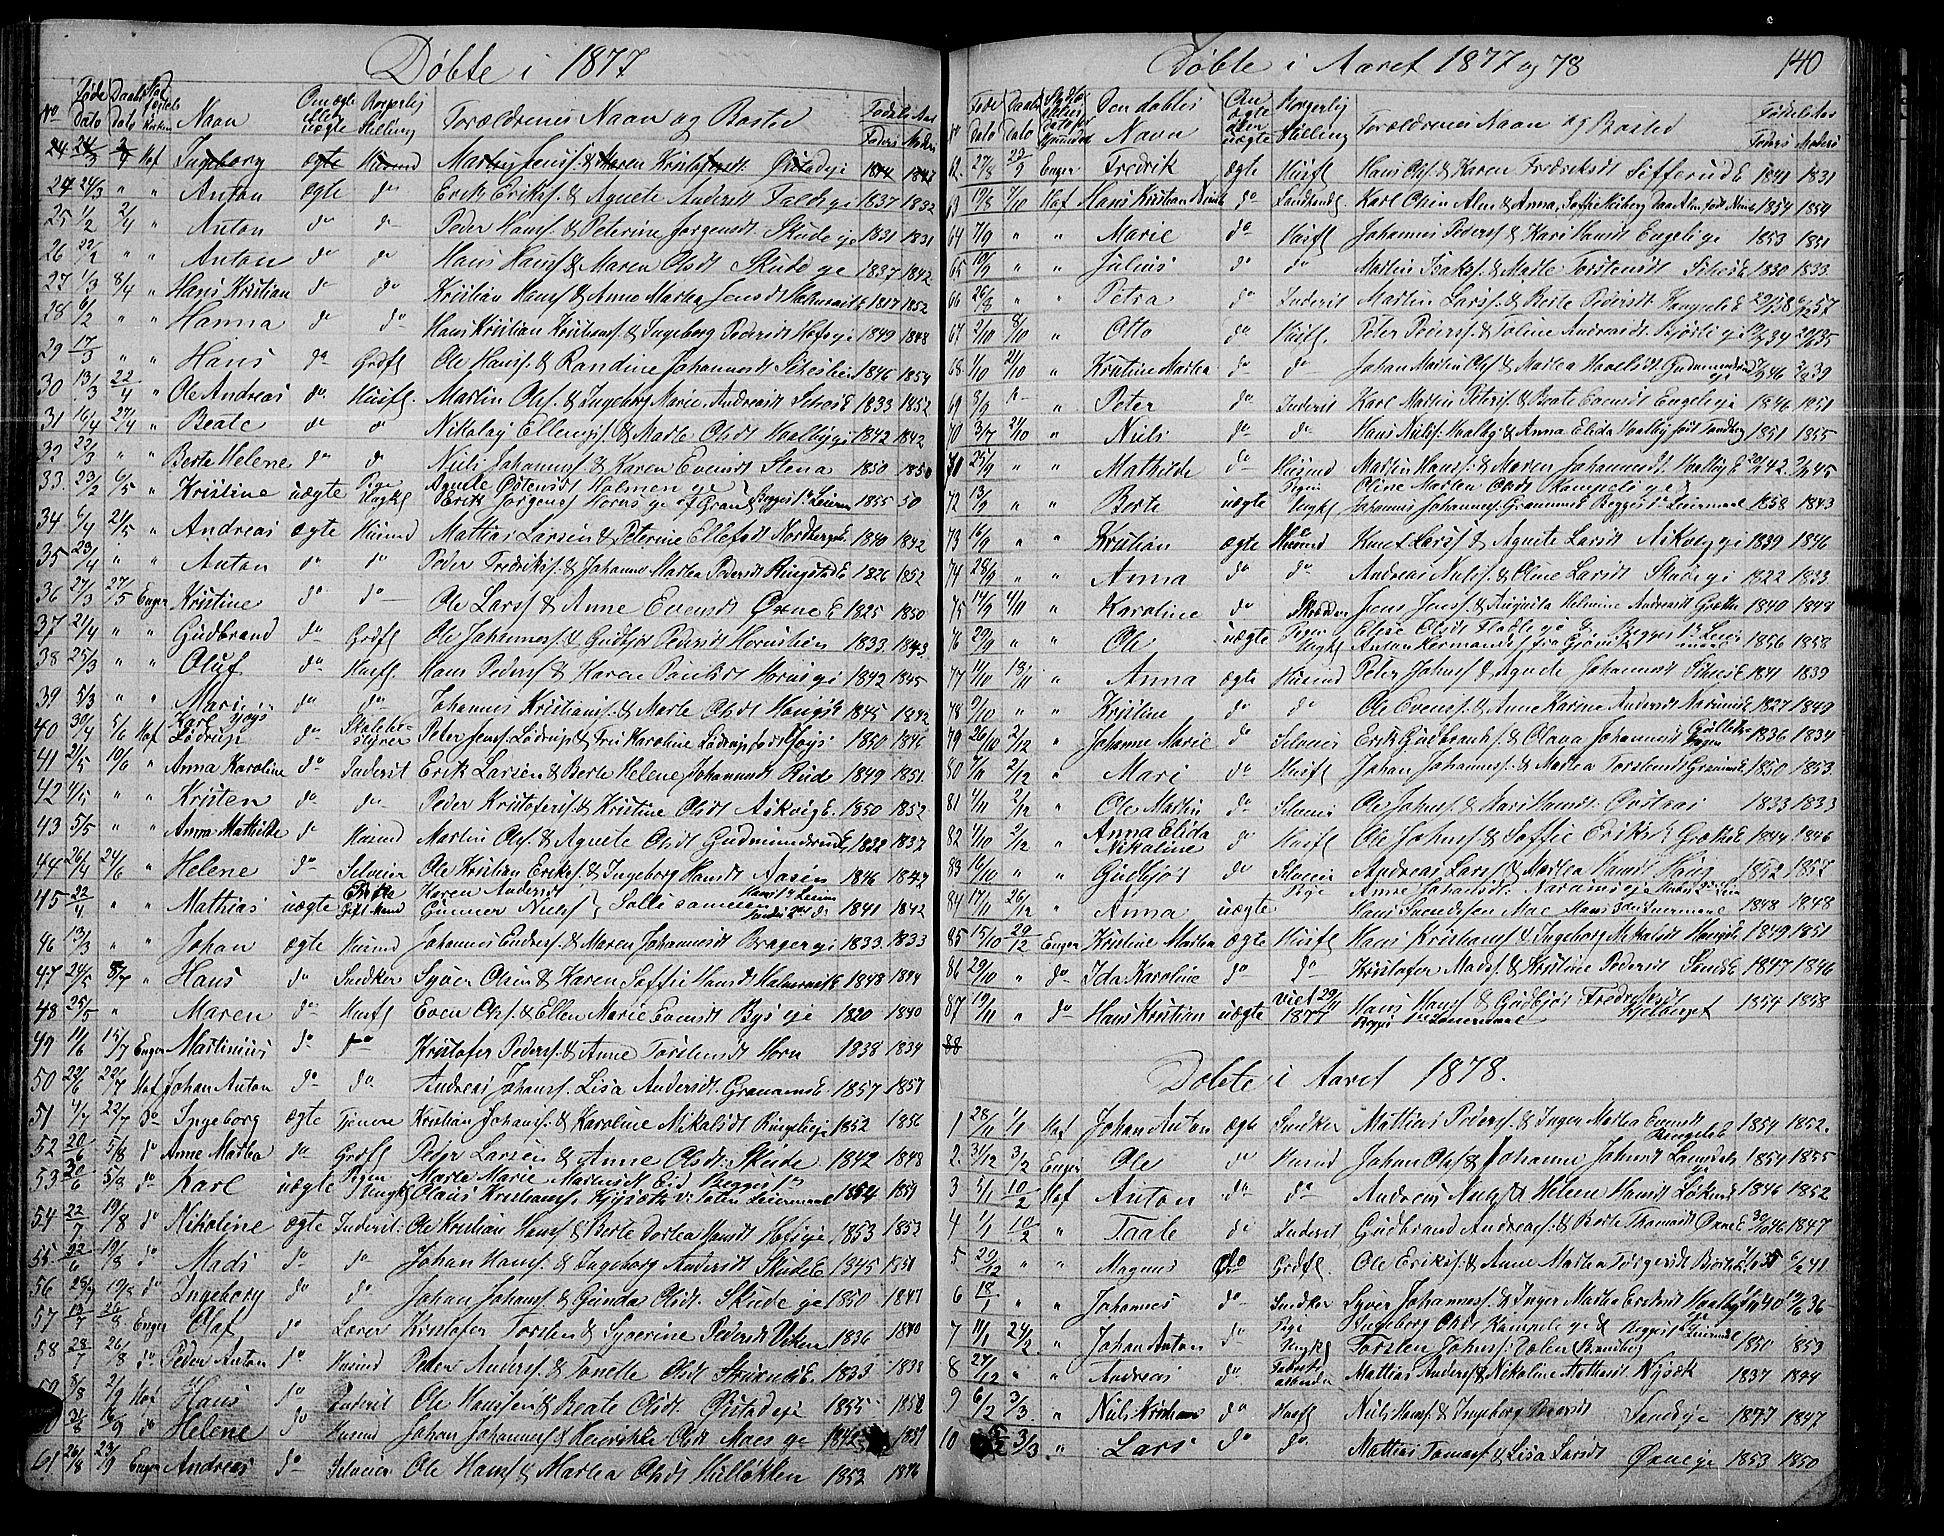 SAH, Søndre Land prestekontor, L/L0001: Klokkerbok nr. 1, 1849-1883, s. 140